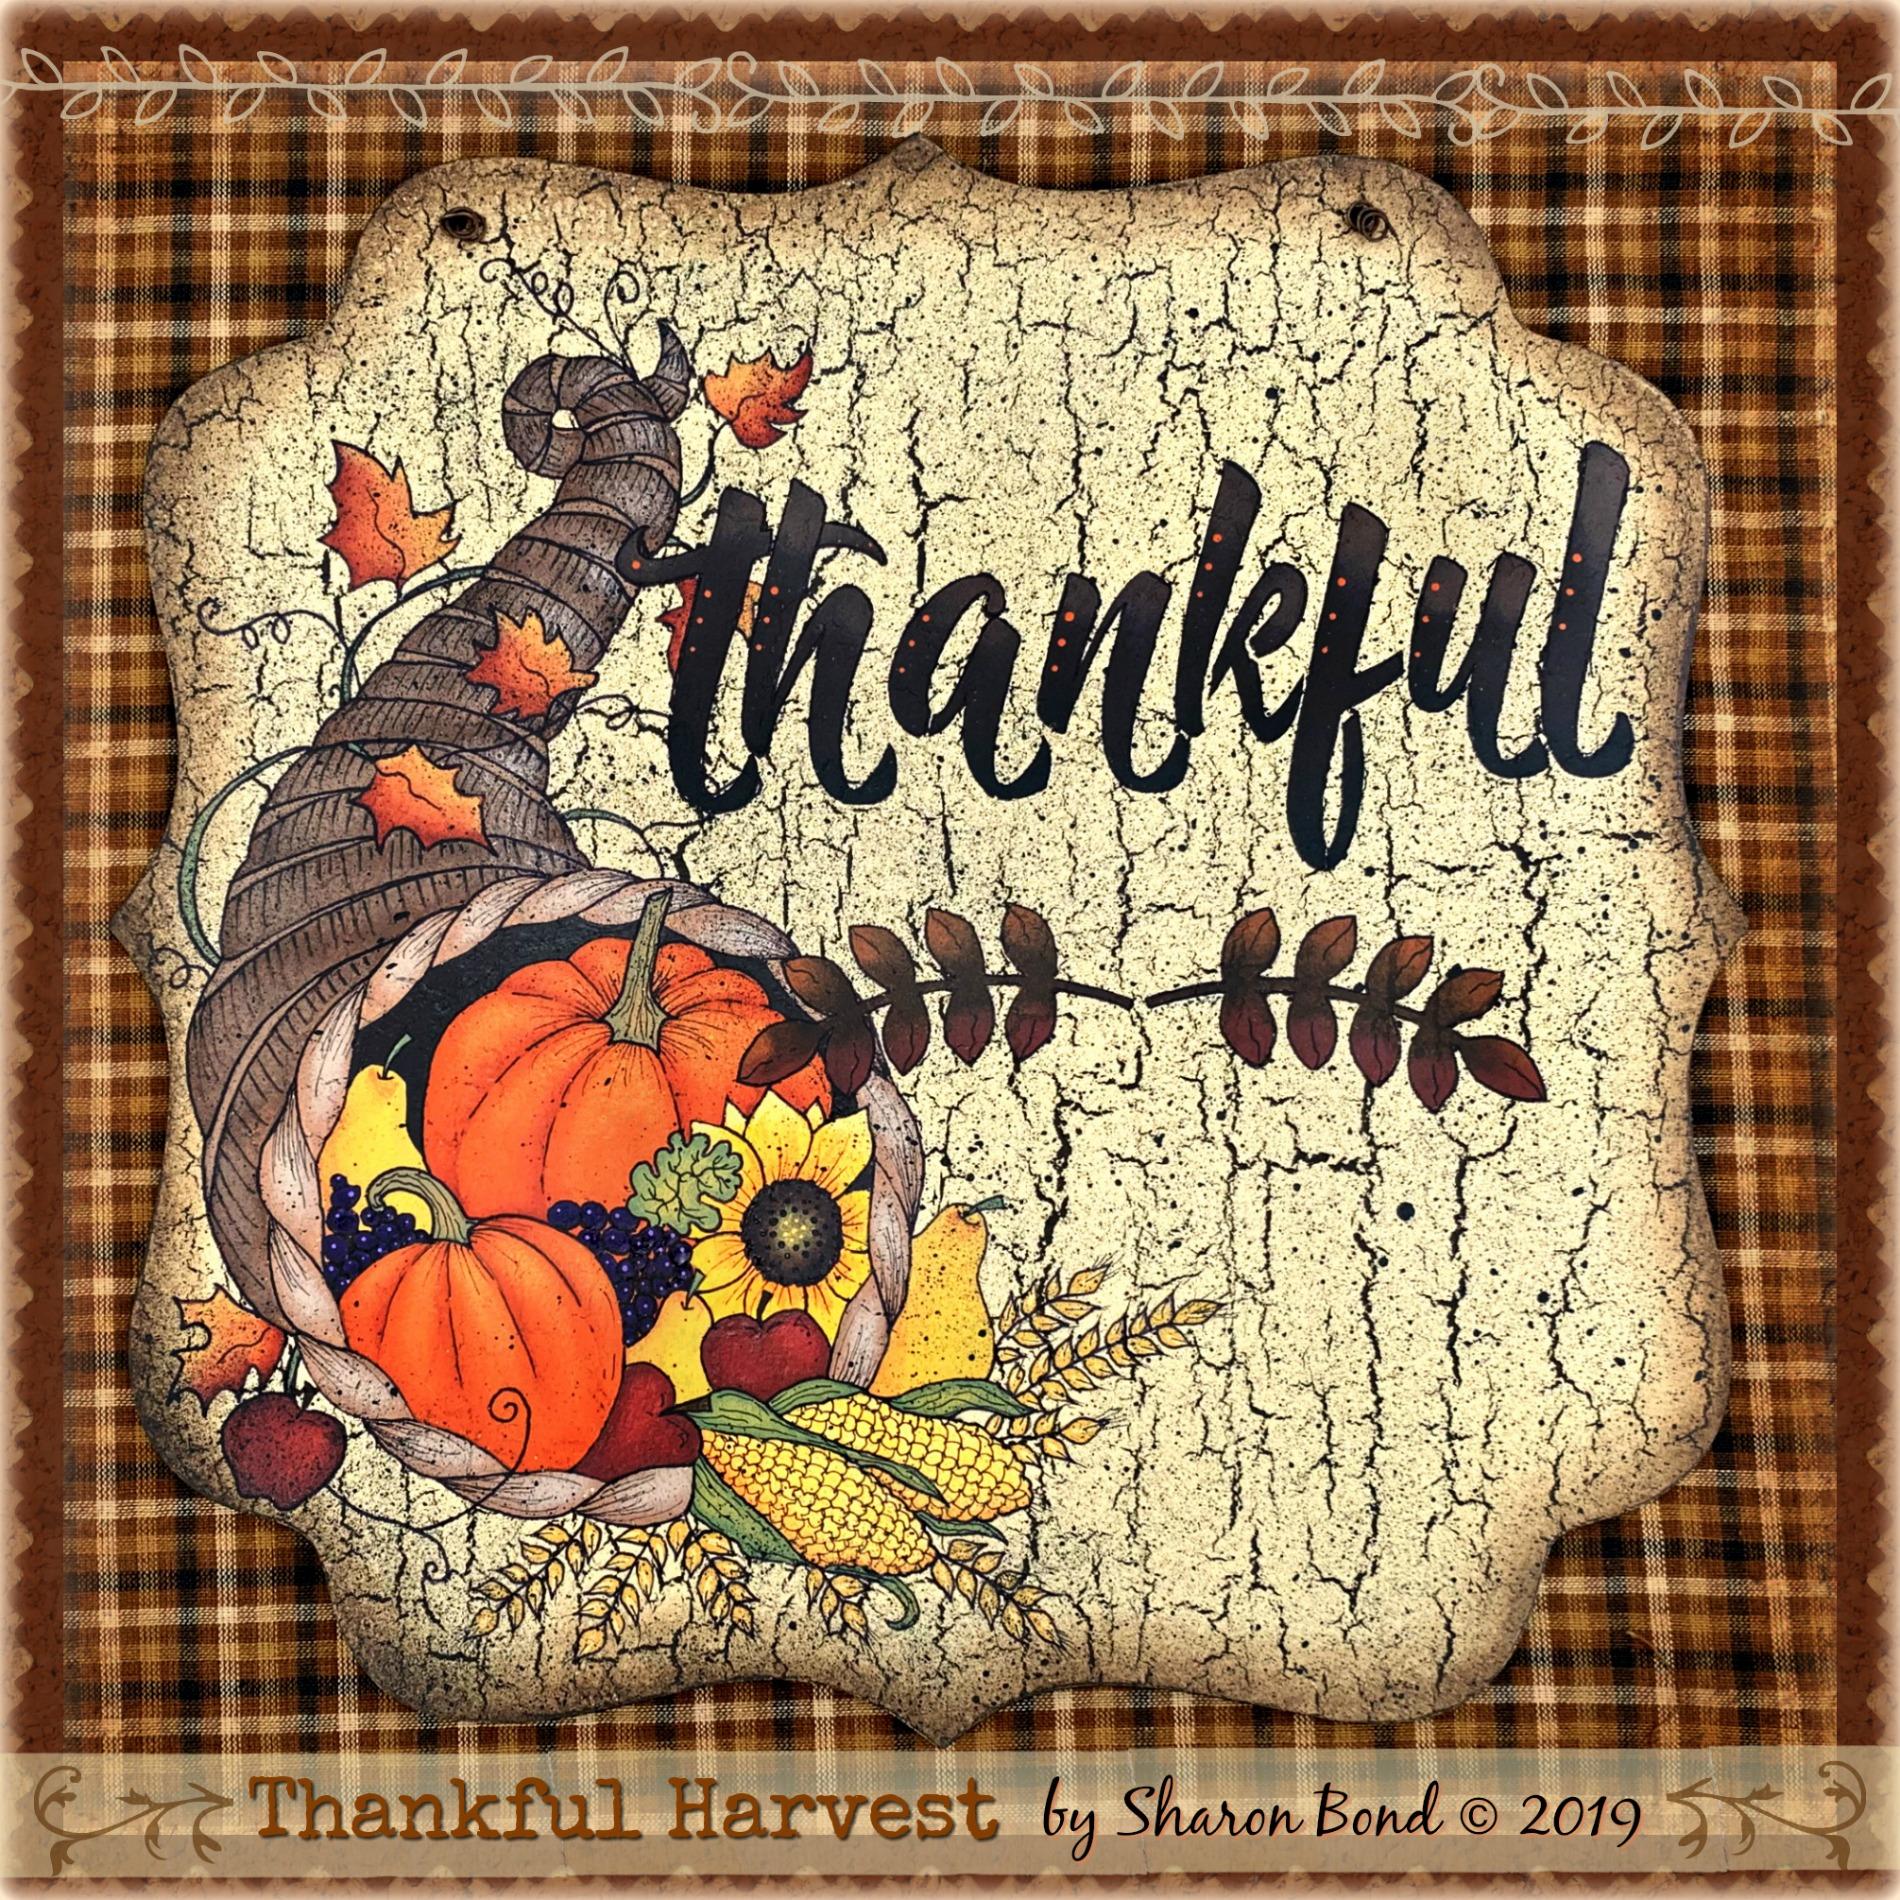 Thankful Harvest - E-Packet - Sharon Bond